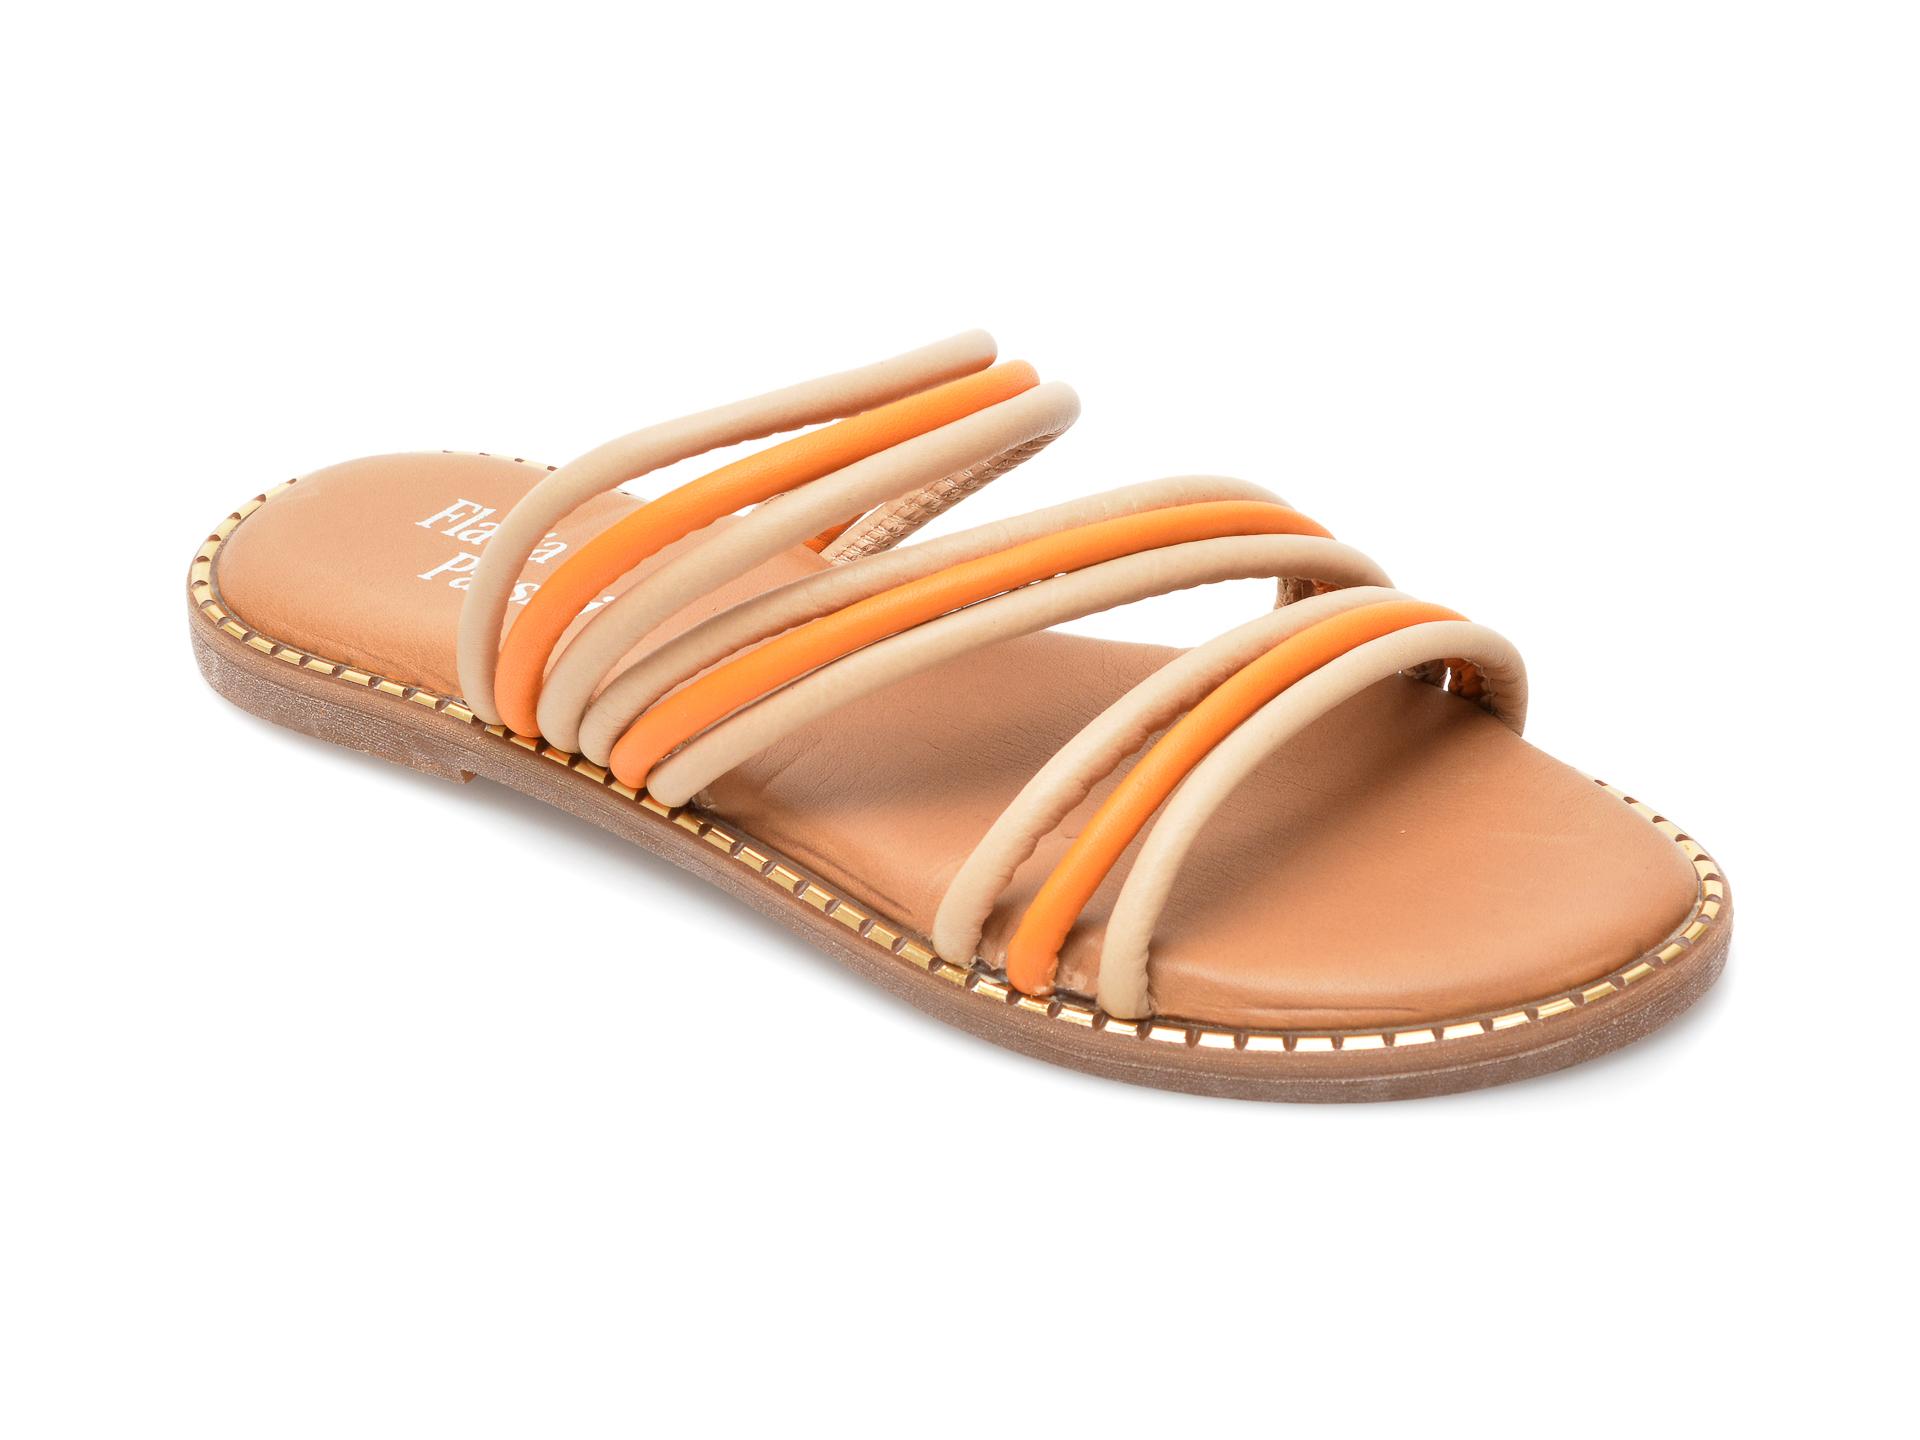 Papuci FLAVIA PASSINI bej, 3044, din piele naturala imagine otter.ro 2021